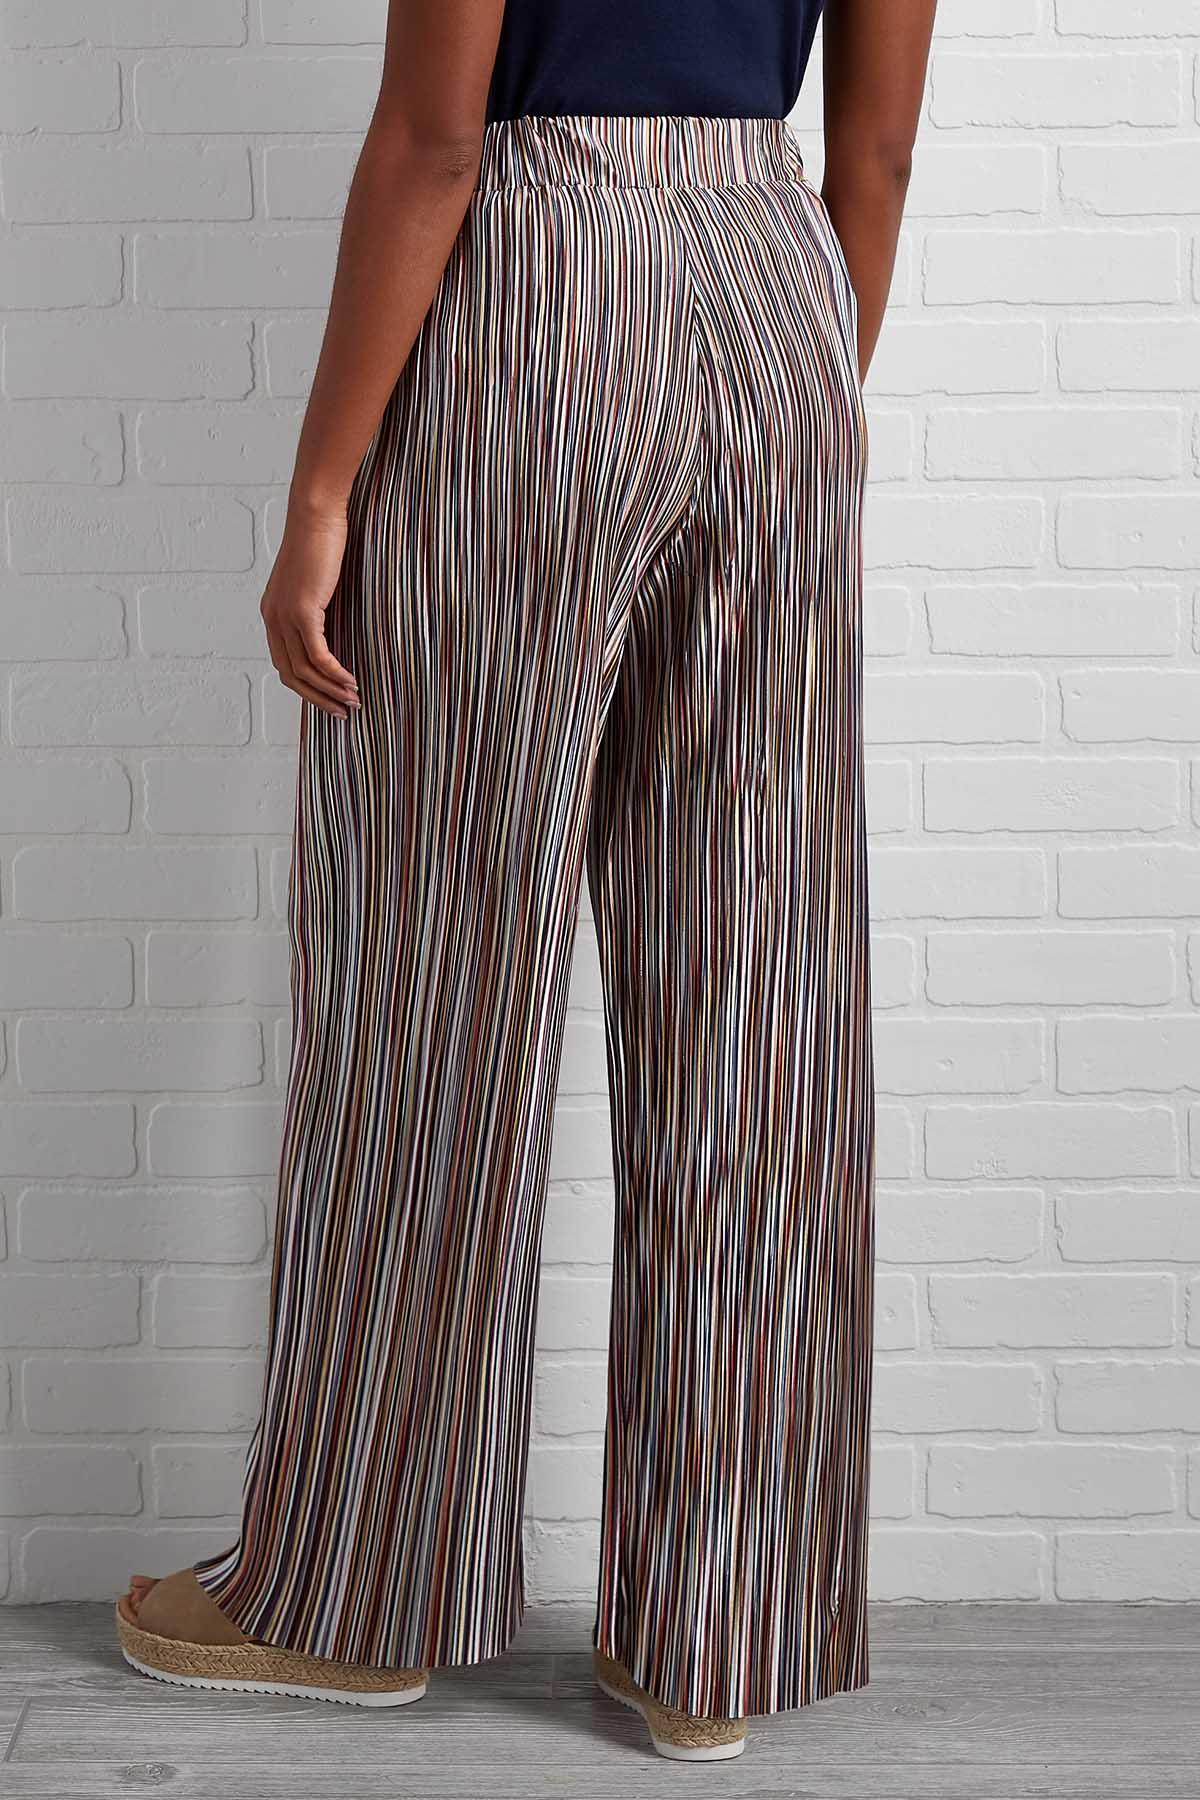 I Walk The Line Pants